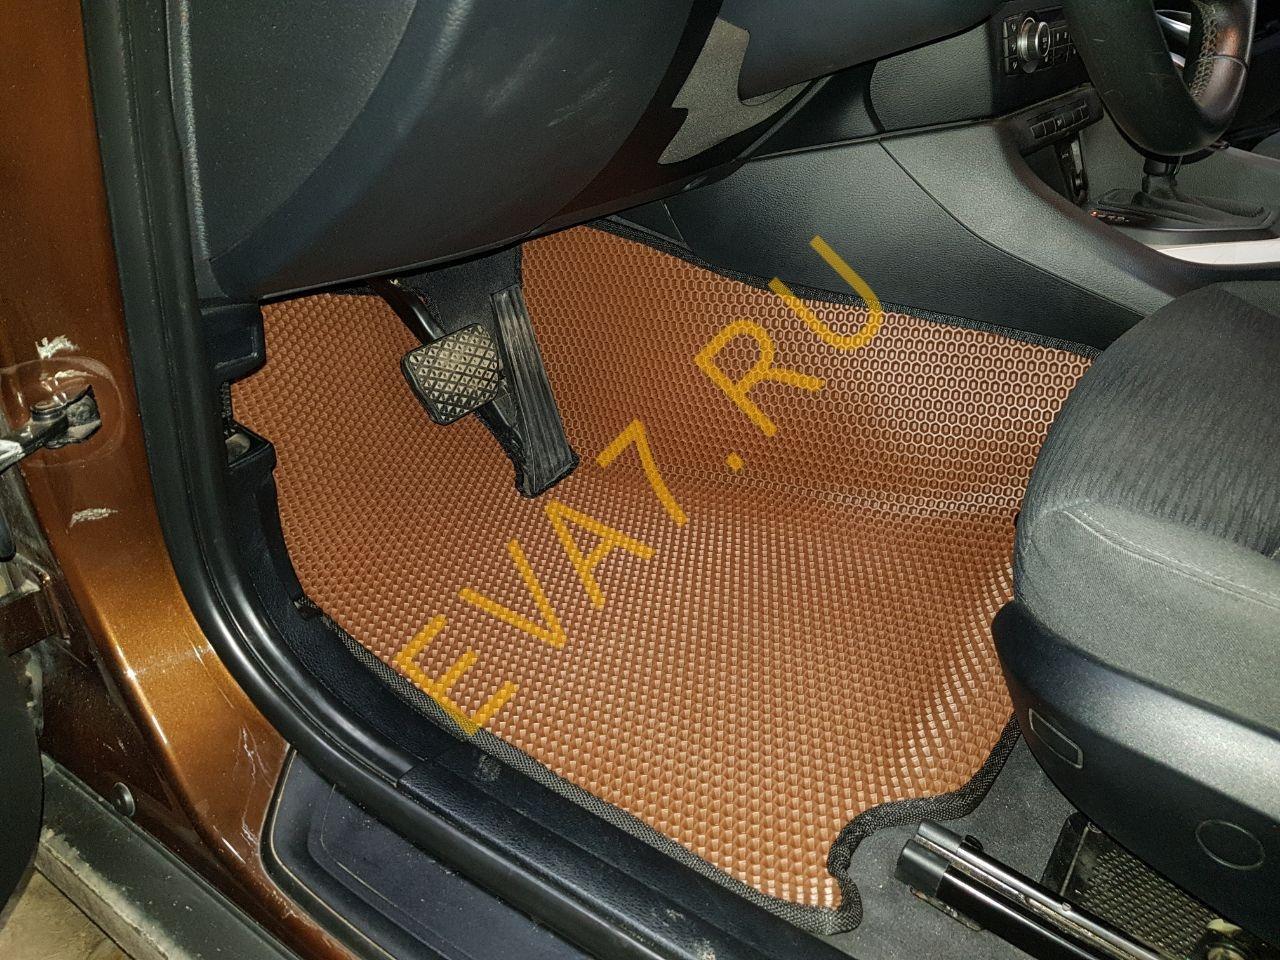 Коврики в салон BMW X1 (E84) вариант макси 3D 2009-2015